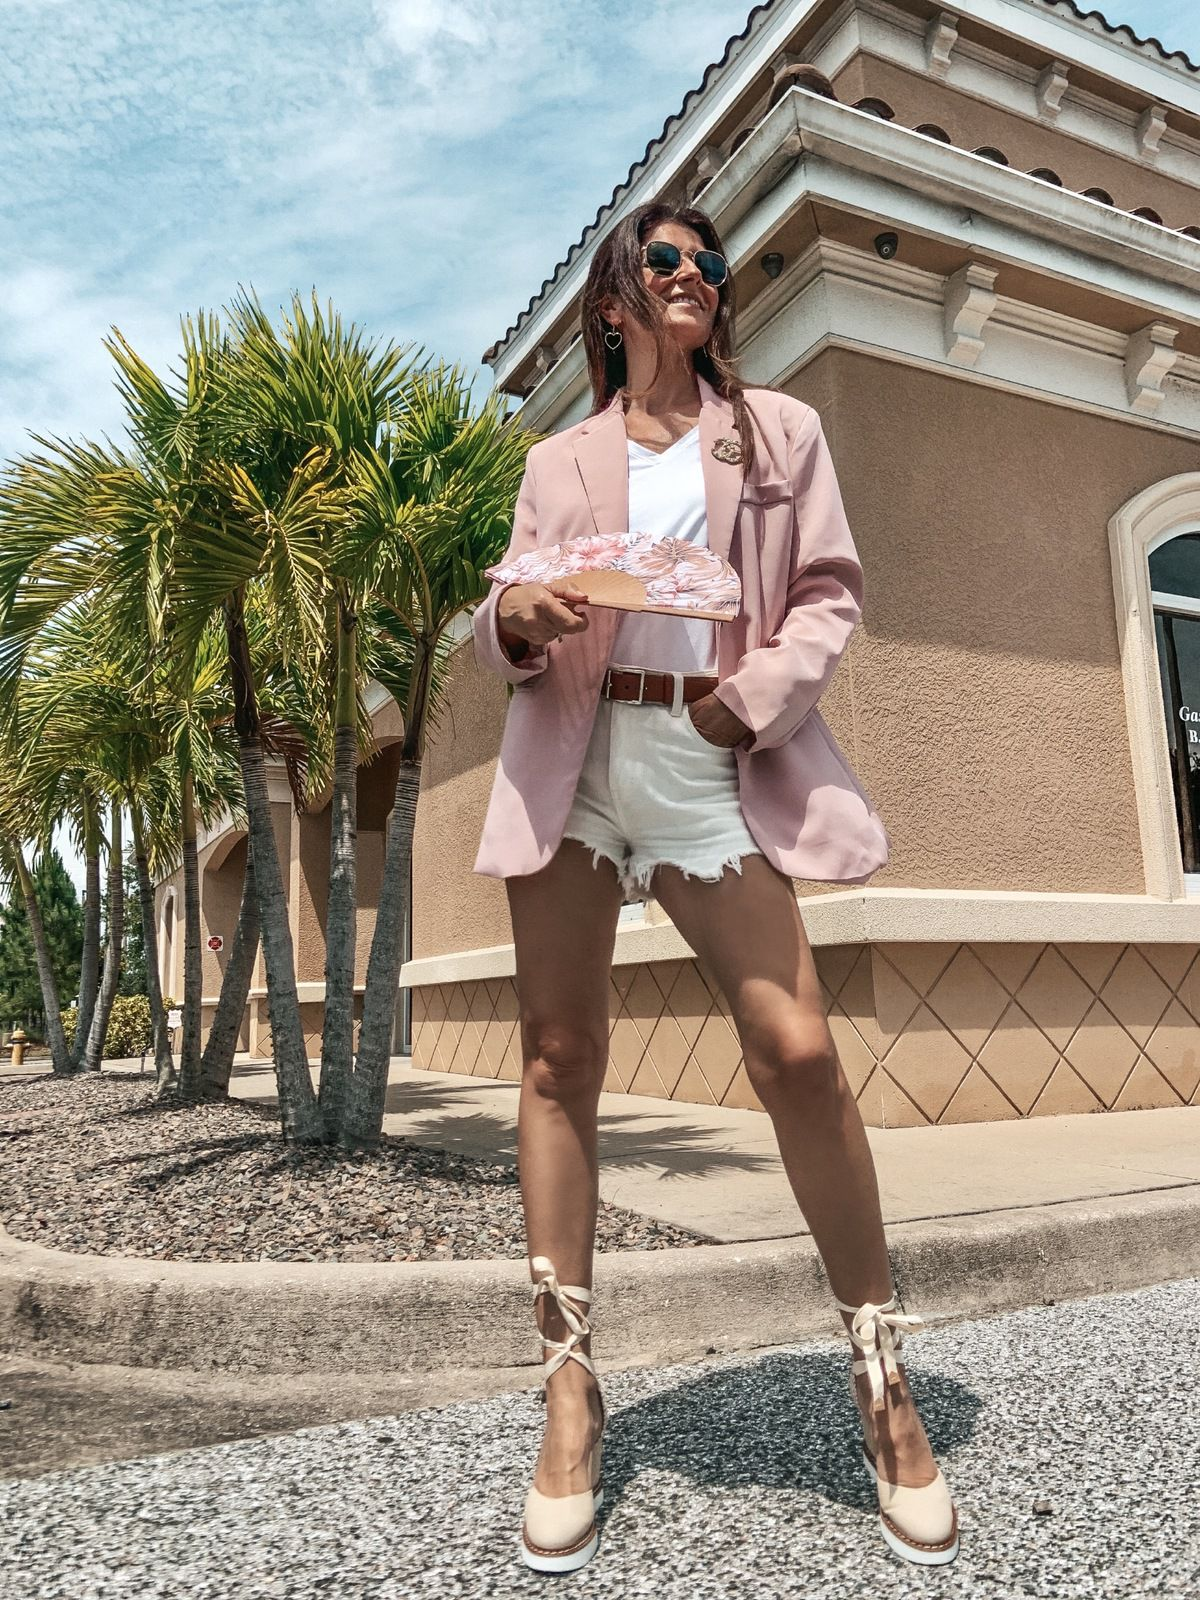 Shorts and blazer... Summer attire